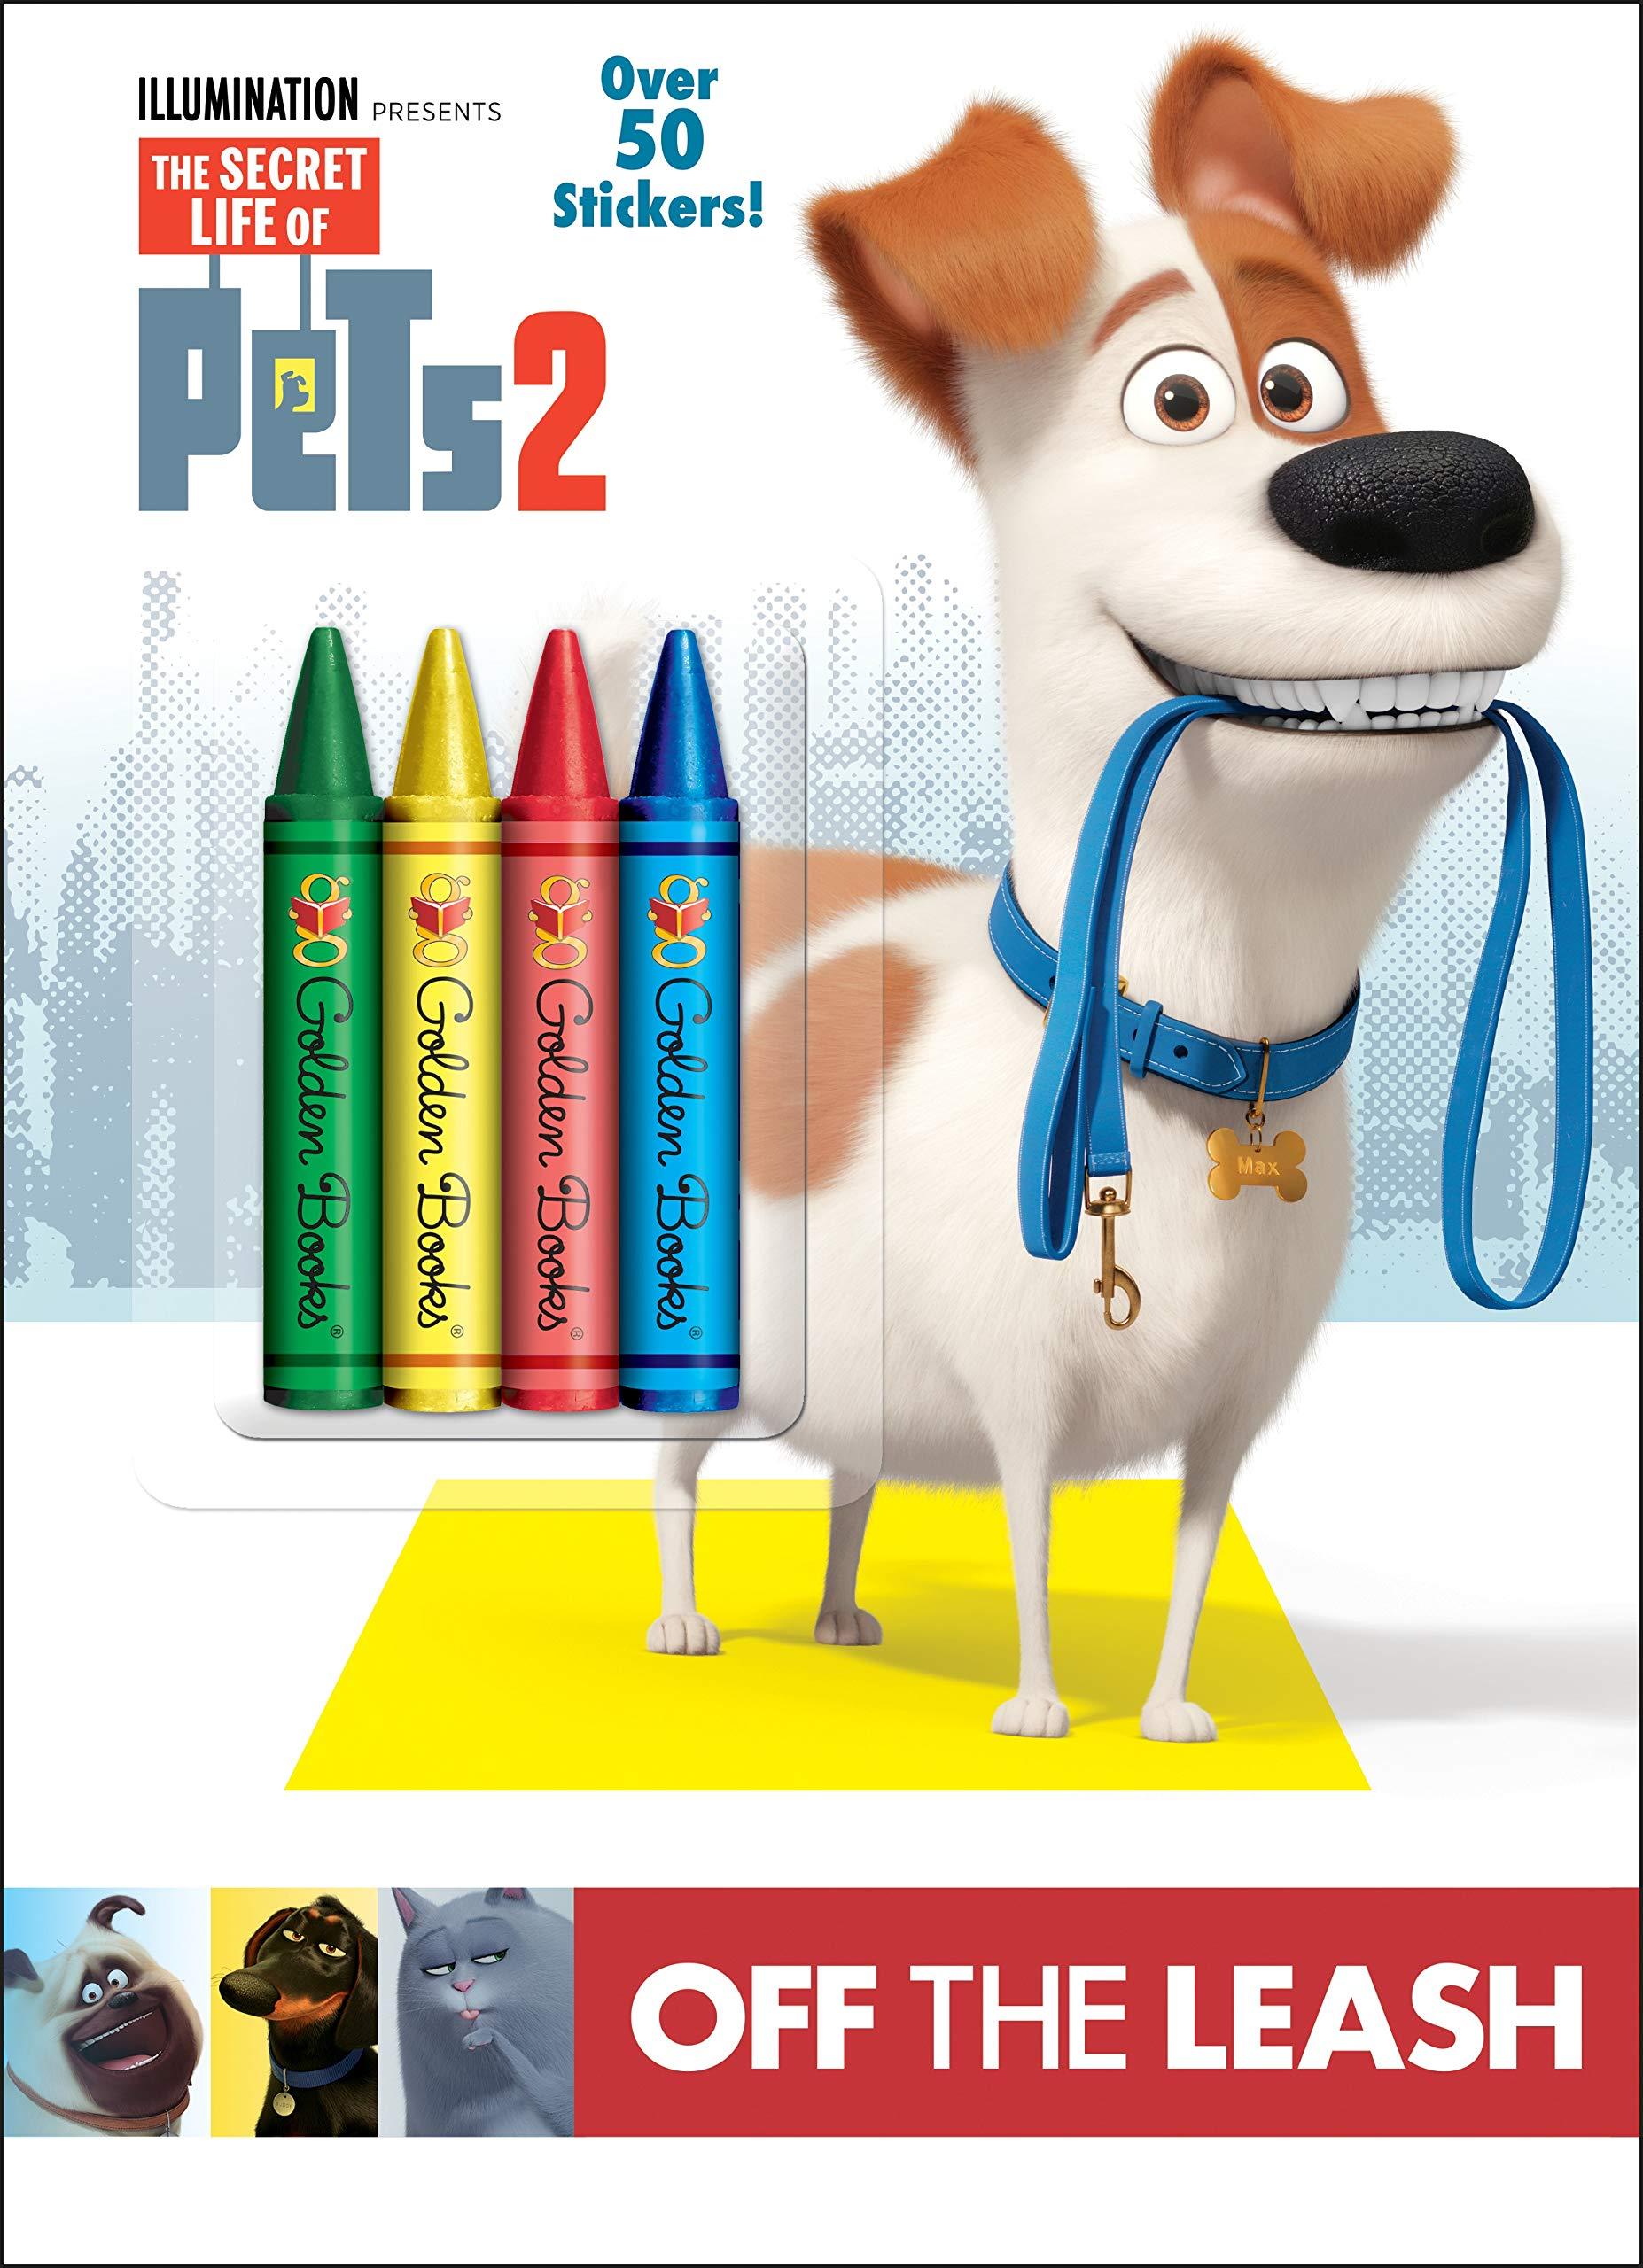 Off The Leash The Secret Life Of Pets 2 Random House Random House 9781984849816 Amazon Com Books